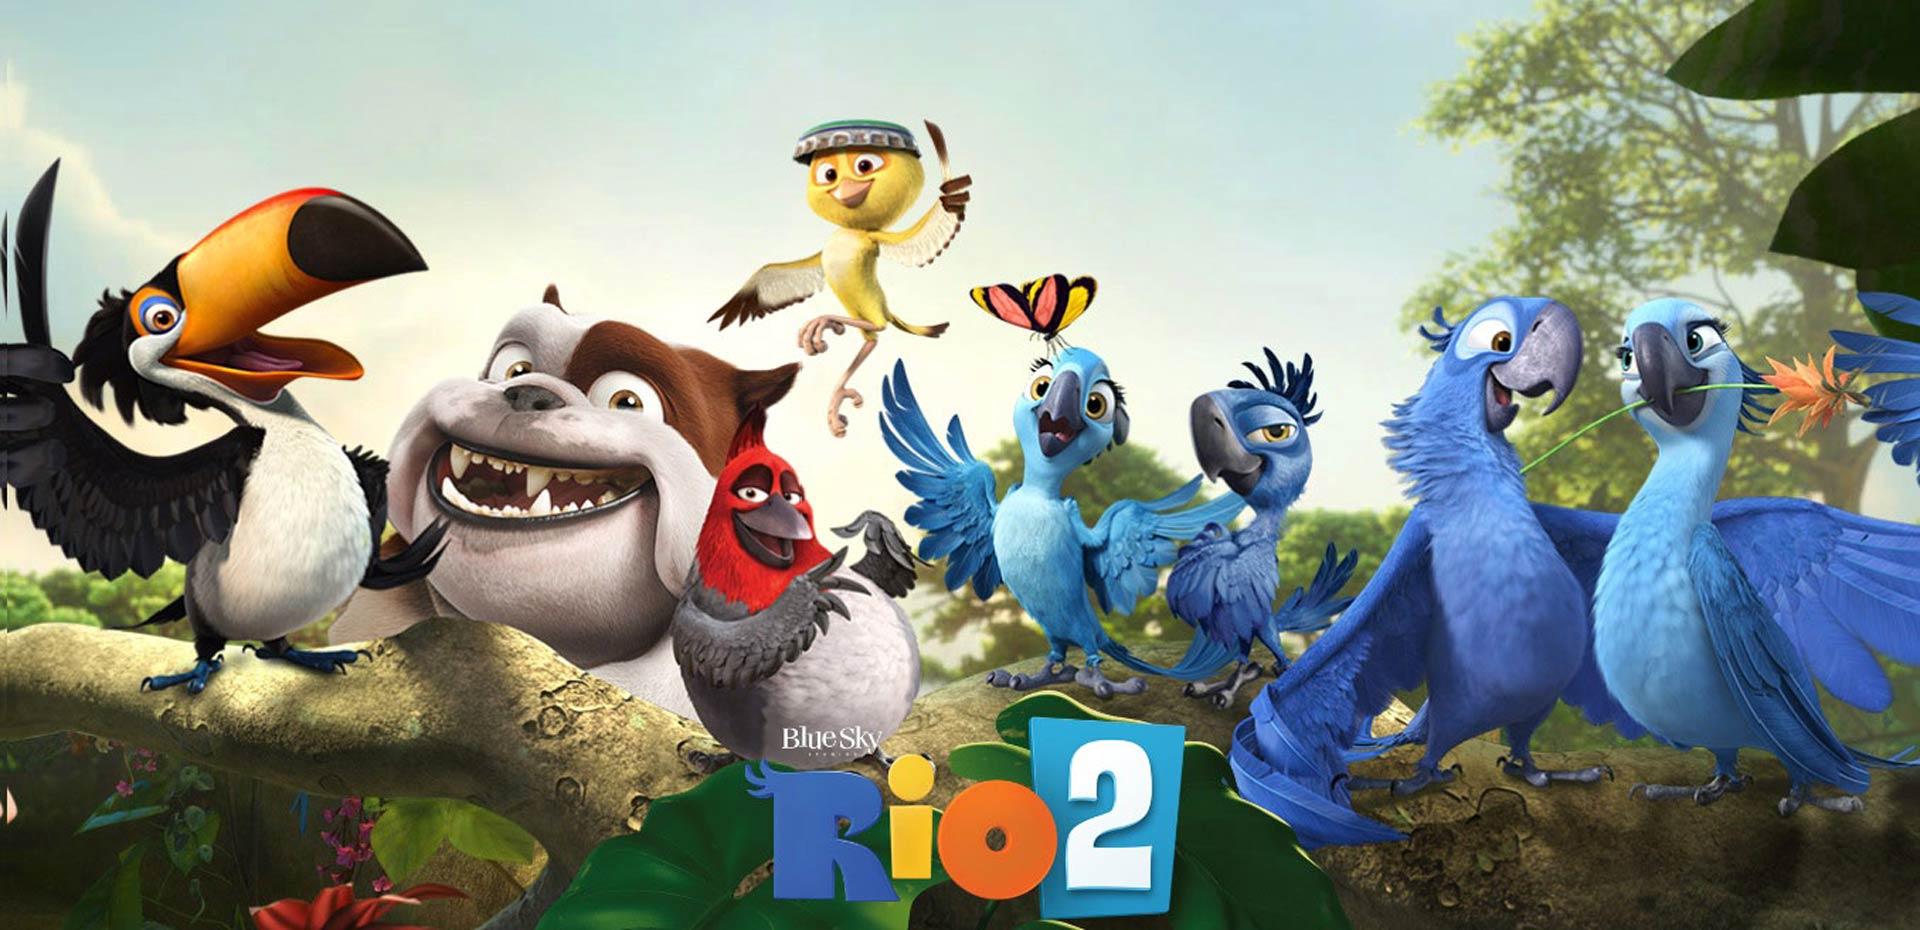 Rio 2 Poster 4 - Reel ...